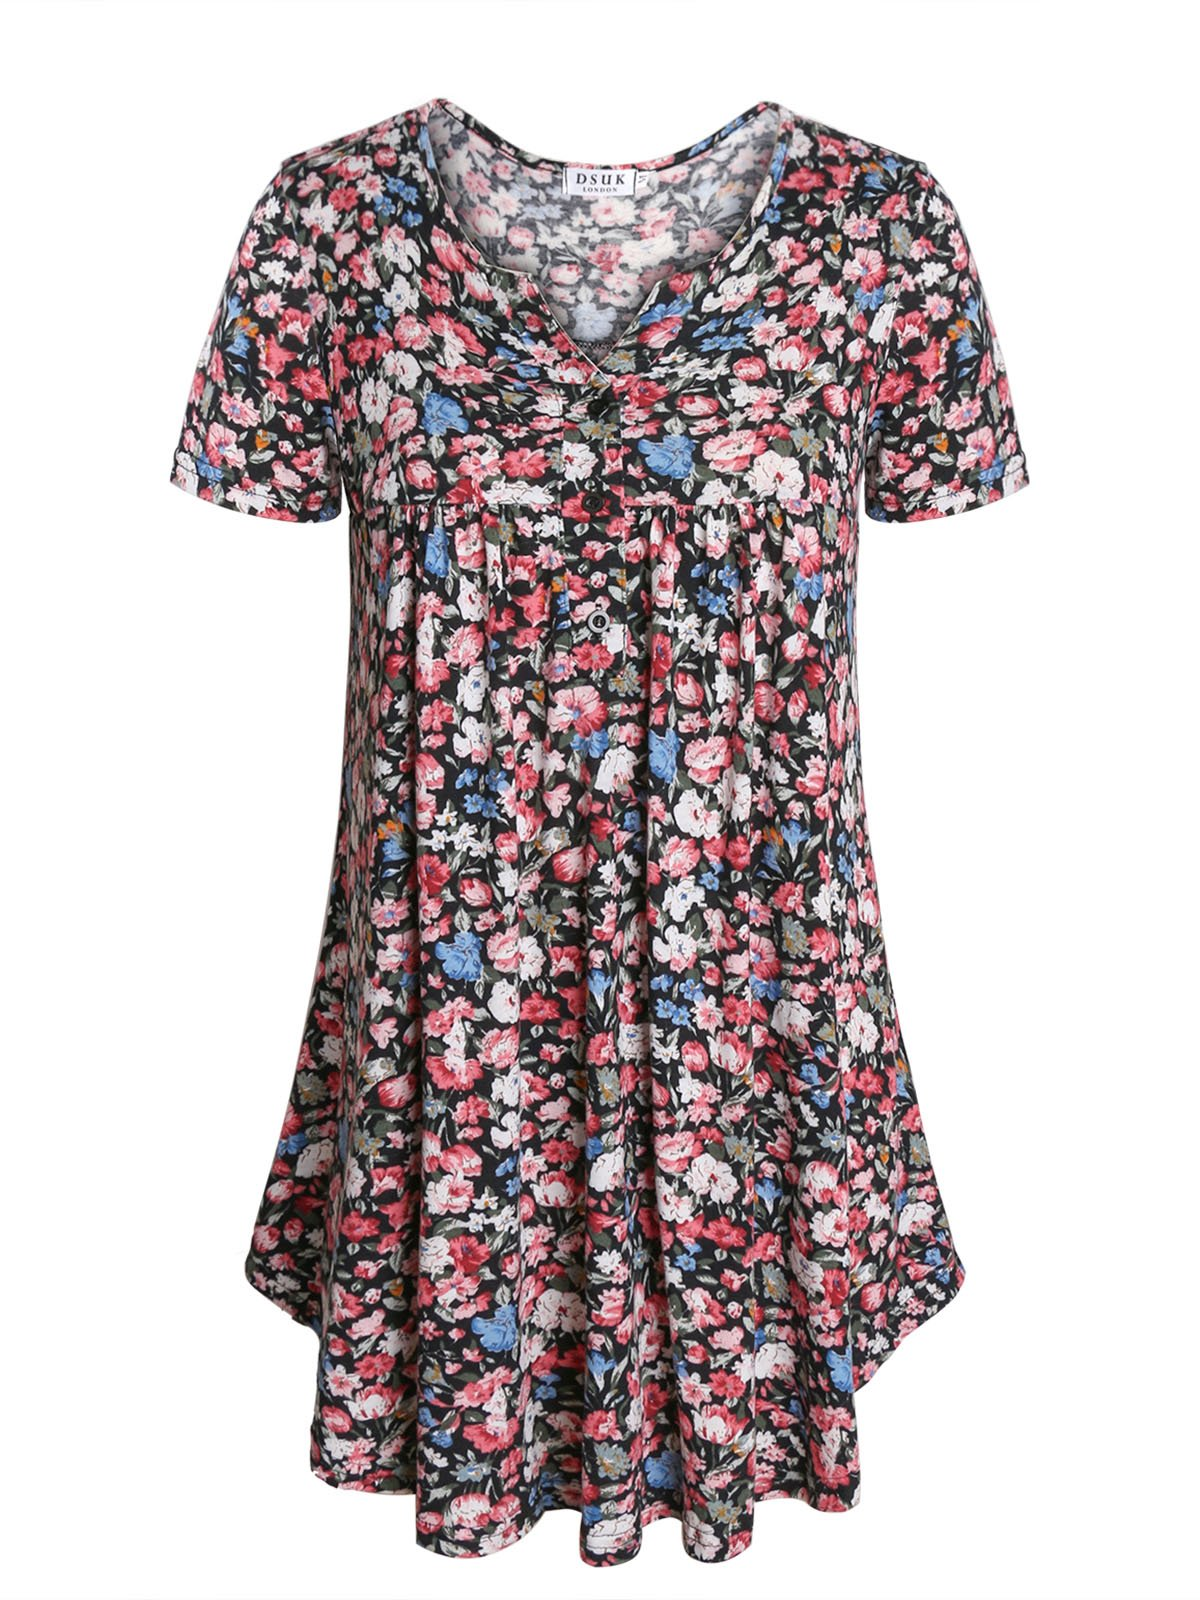 Floral Tunics for Women,DSUK Women Short Sleeve Round Neck Drape Front Daily Wearing Flower Print Tops Scallop Hem Soft Comfy Fabric Lightweight Fitted Shirts Leisure Blouse Black Medium